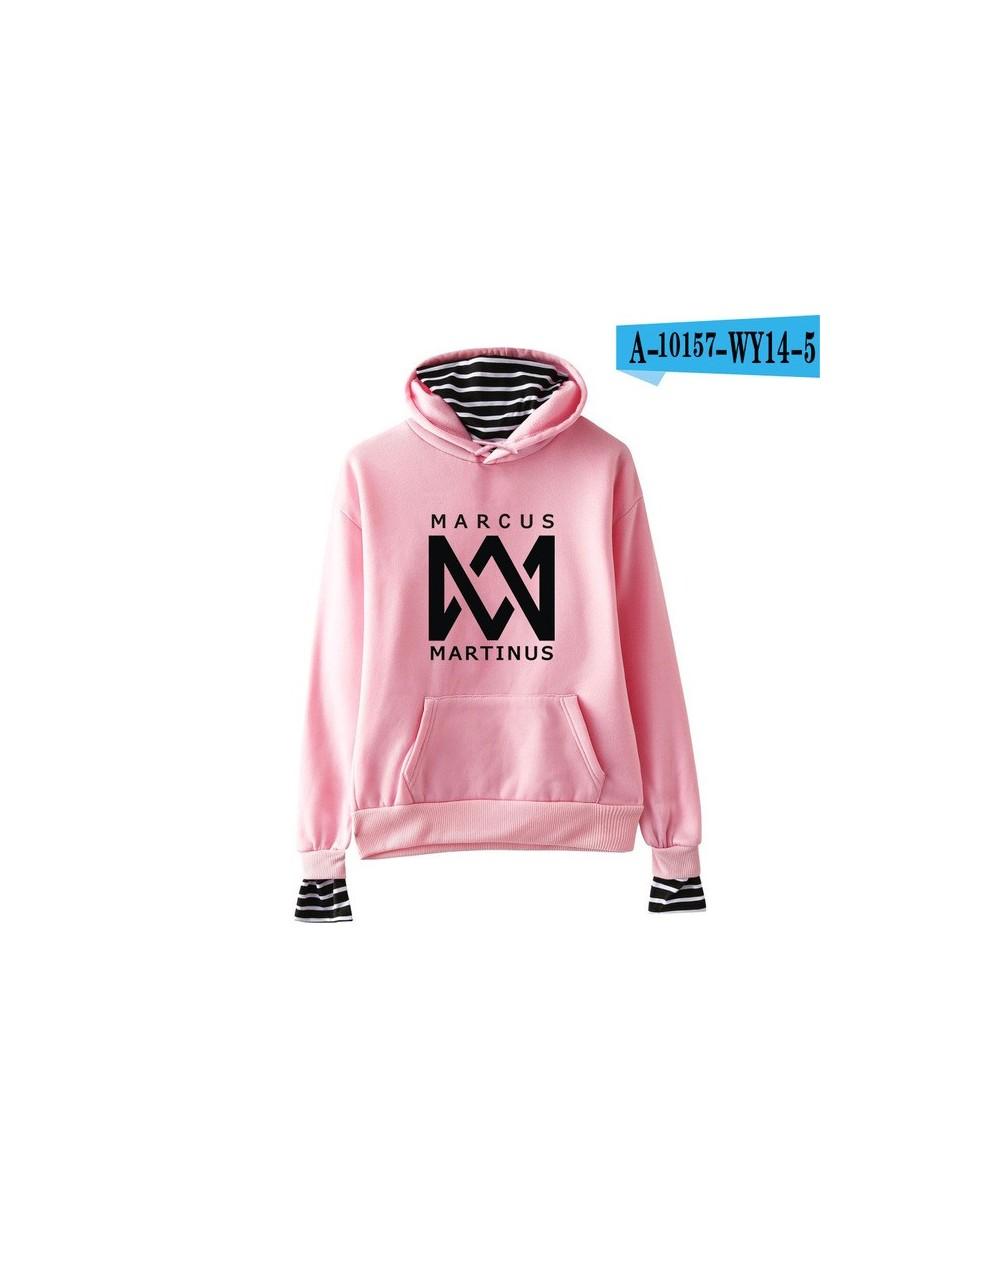 Marcus &martinus Fake two pieces Hoodies Sweatshirt Keep Warm New Style Ouewear Casual Sweatshirt Plus Size - PINK - 4J30557...